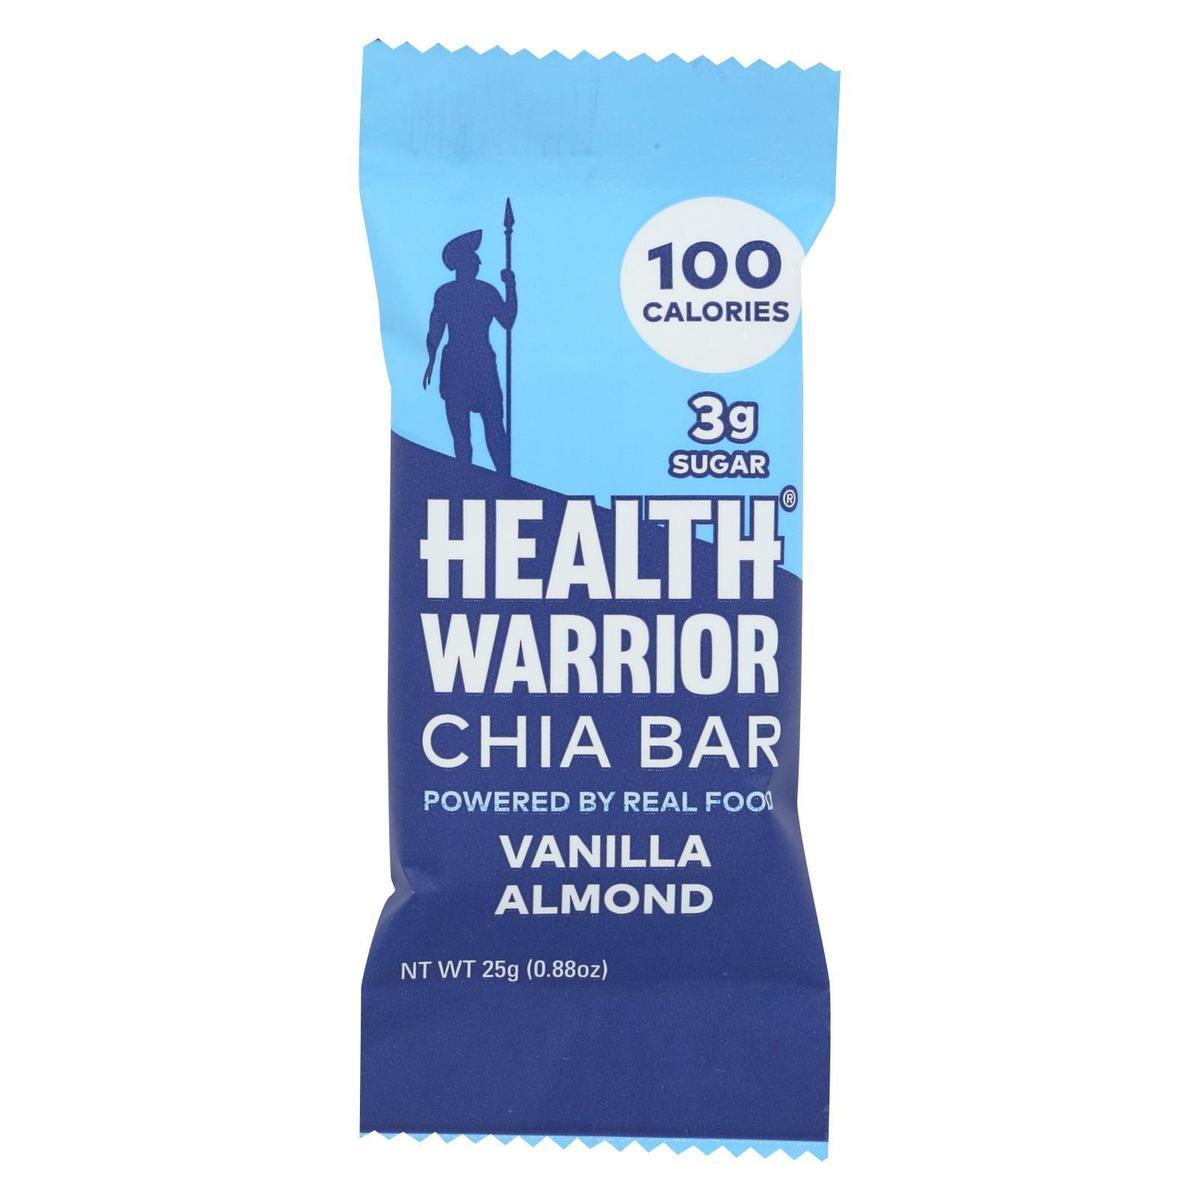 Health Warrior Chia Bar